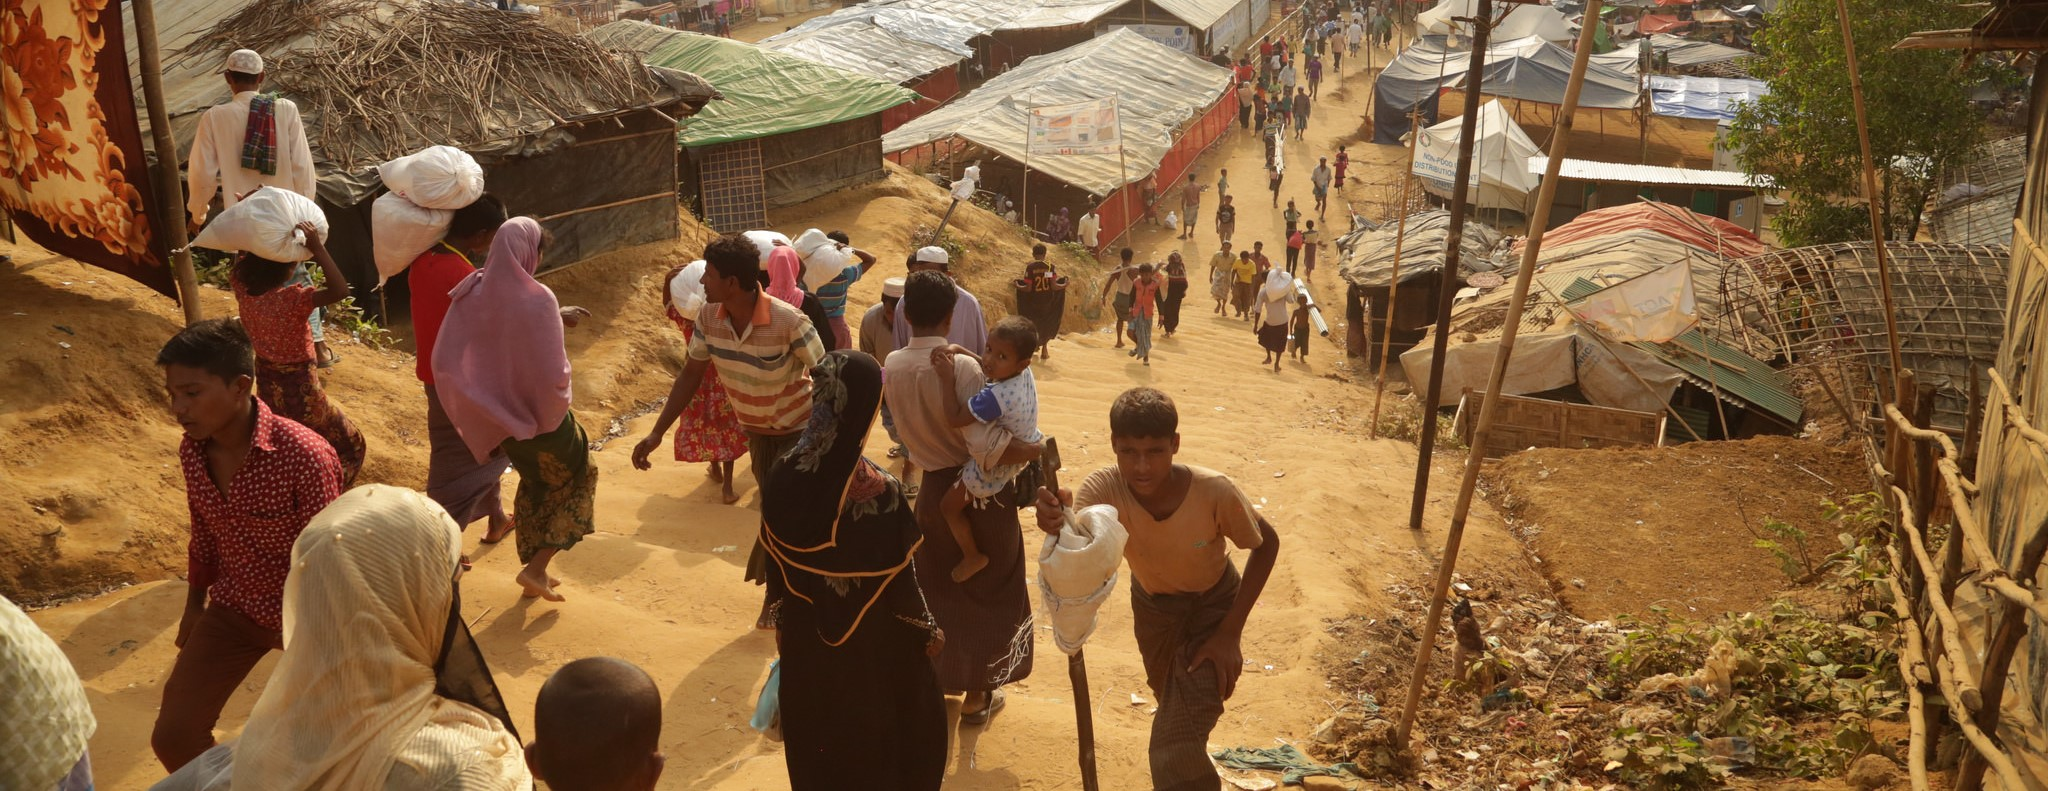 A refugee camp in Bangladesh, November 2017 (Photo: Russell Watkins/Department for International Development/Flickr)